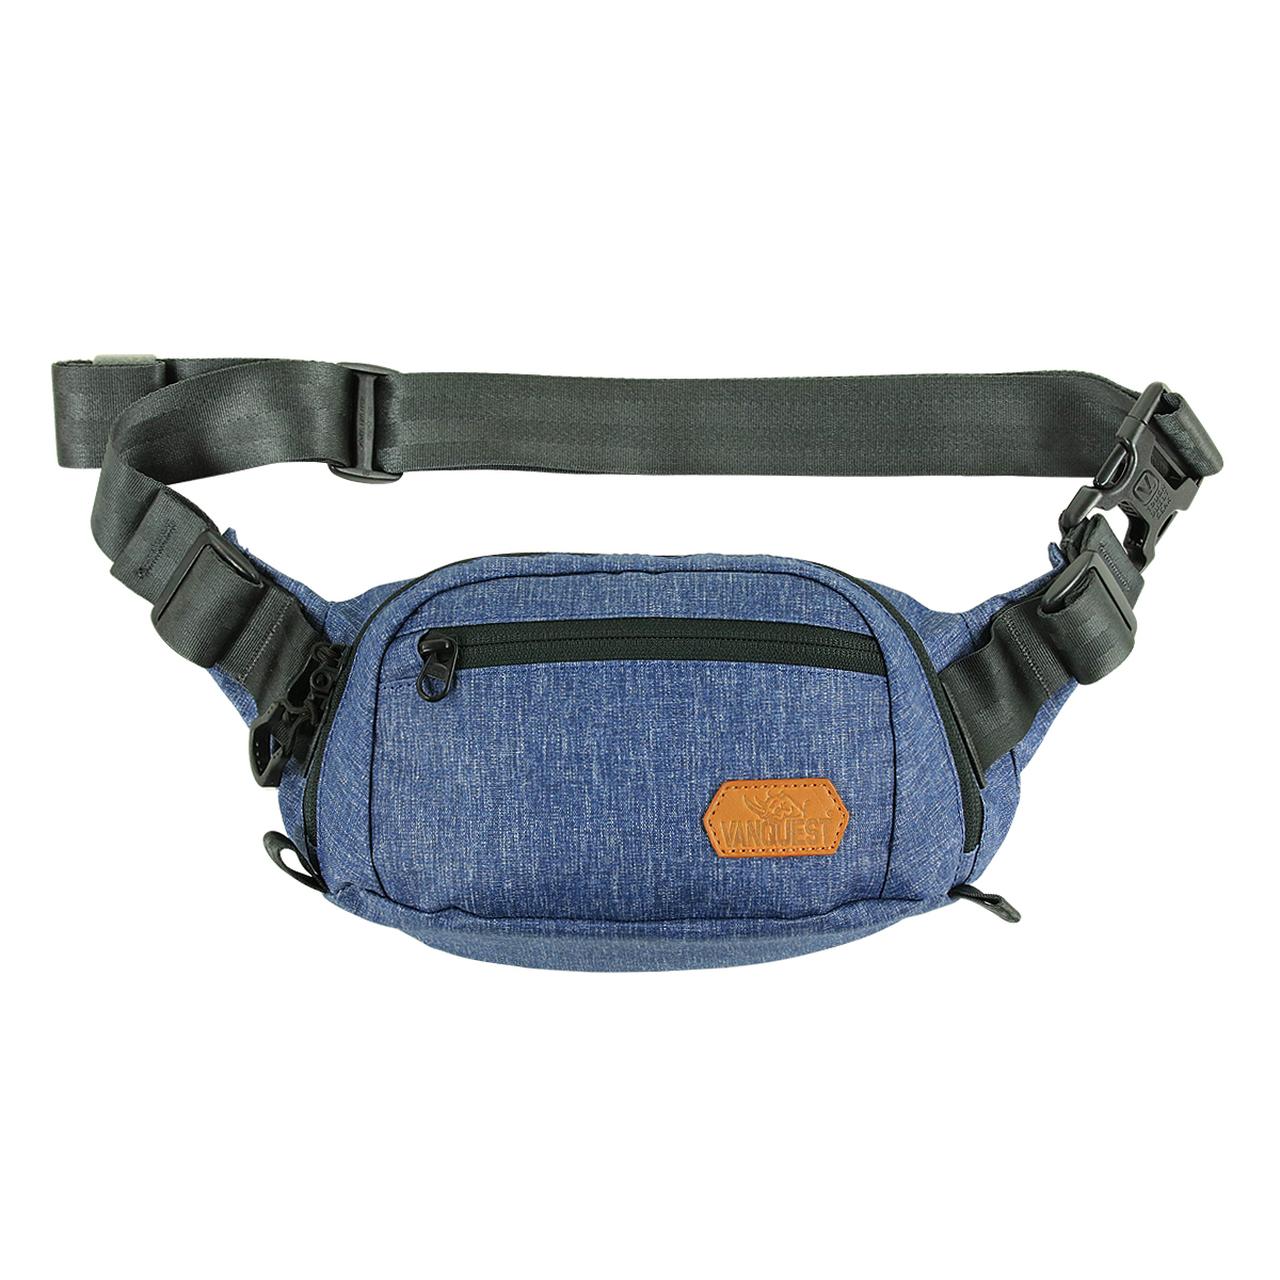 DENDRITE-SMALL Waist Pack - Mitternachts Blau